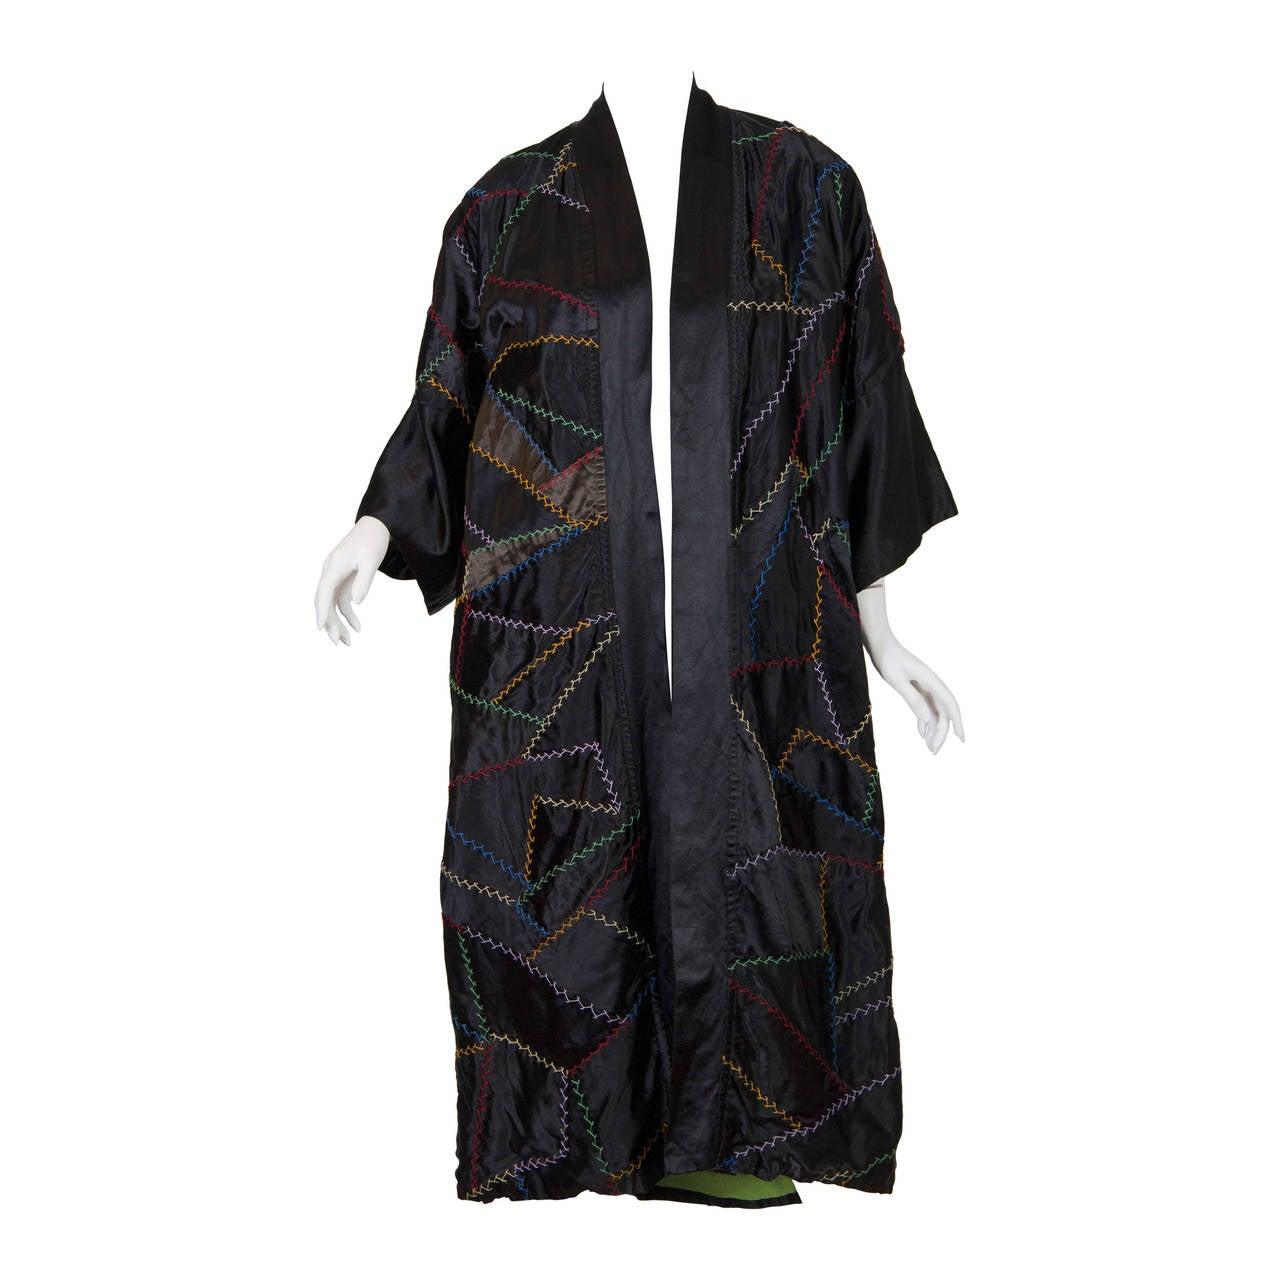 Silk Crazy Quilt Patchwork Coat, 1920s